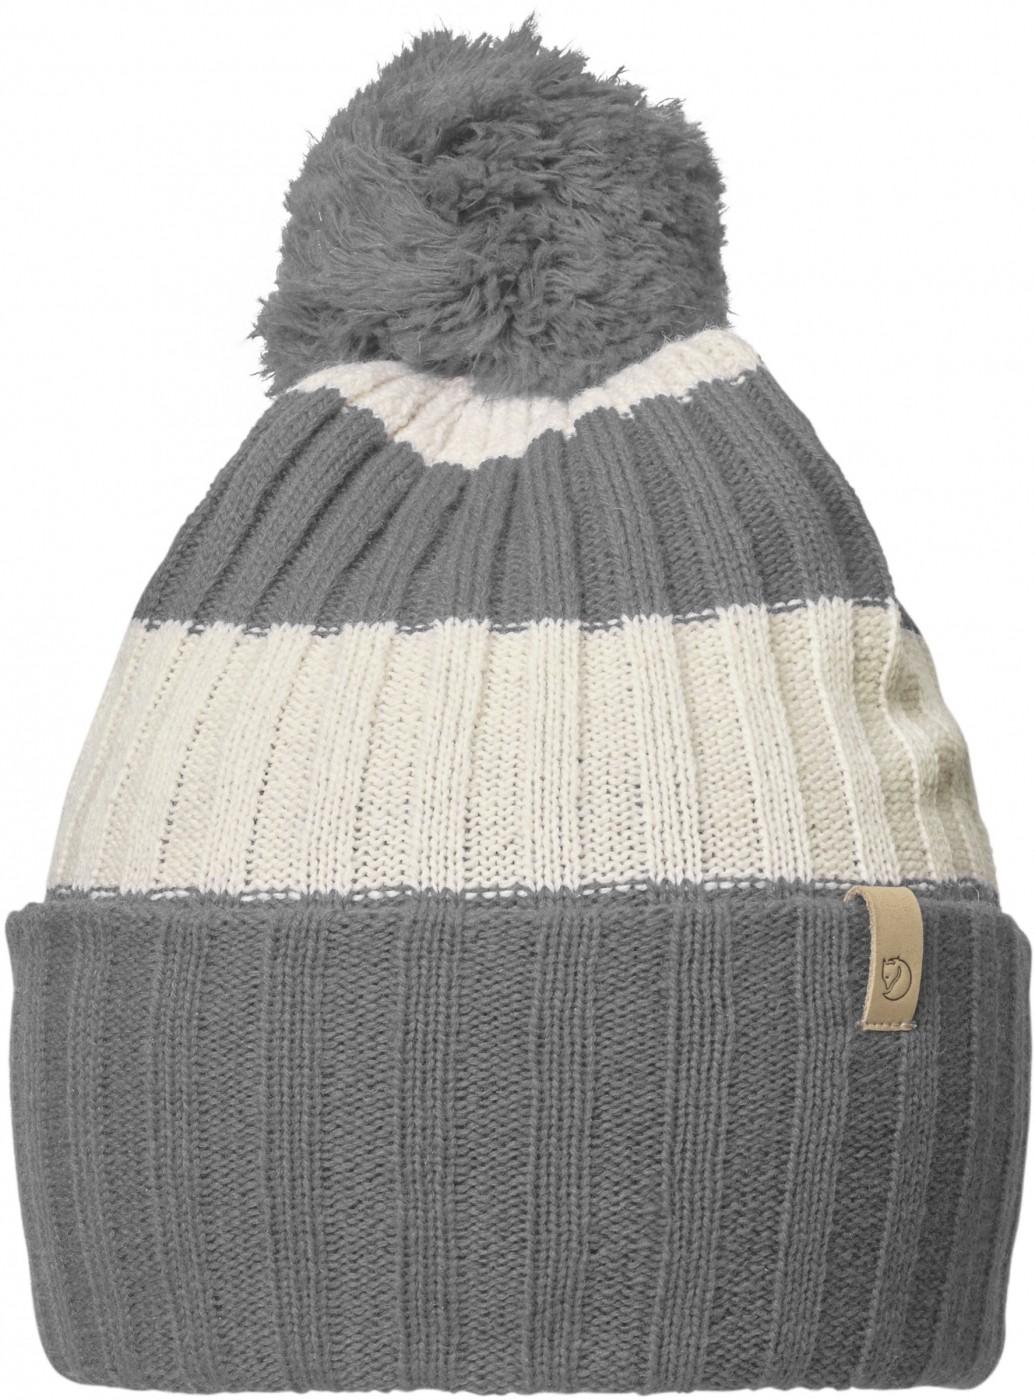 FjallRaven Byron Pom Hat Fog - us 305ba169c1e